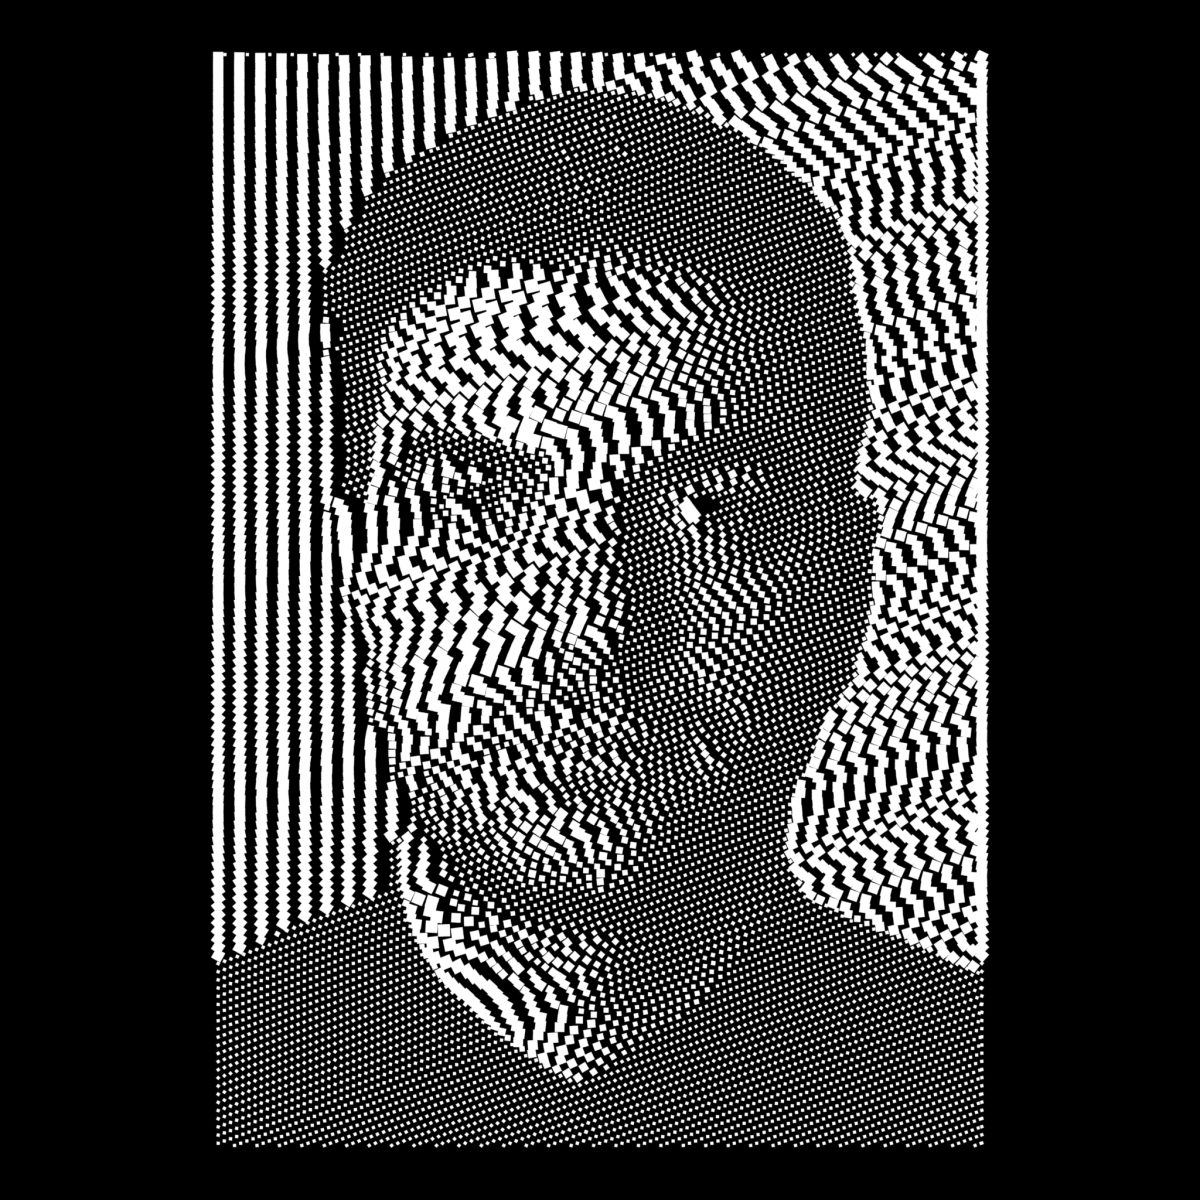 Raster, ch3, generative, raster, render